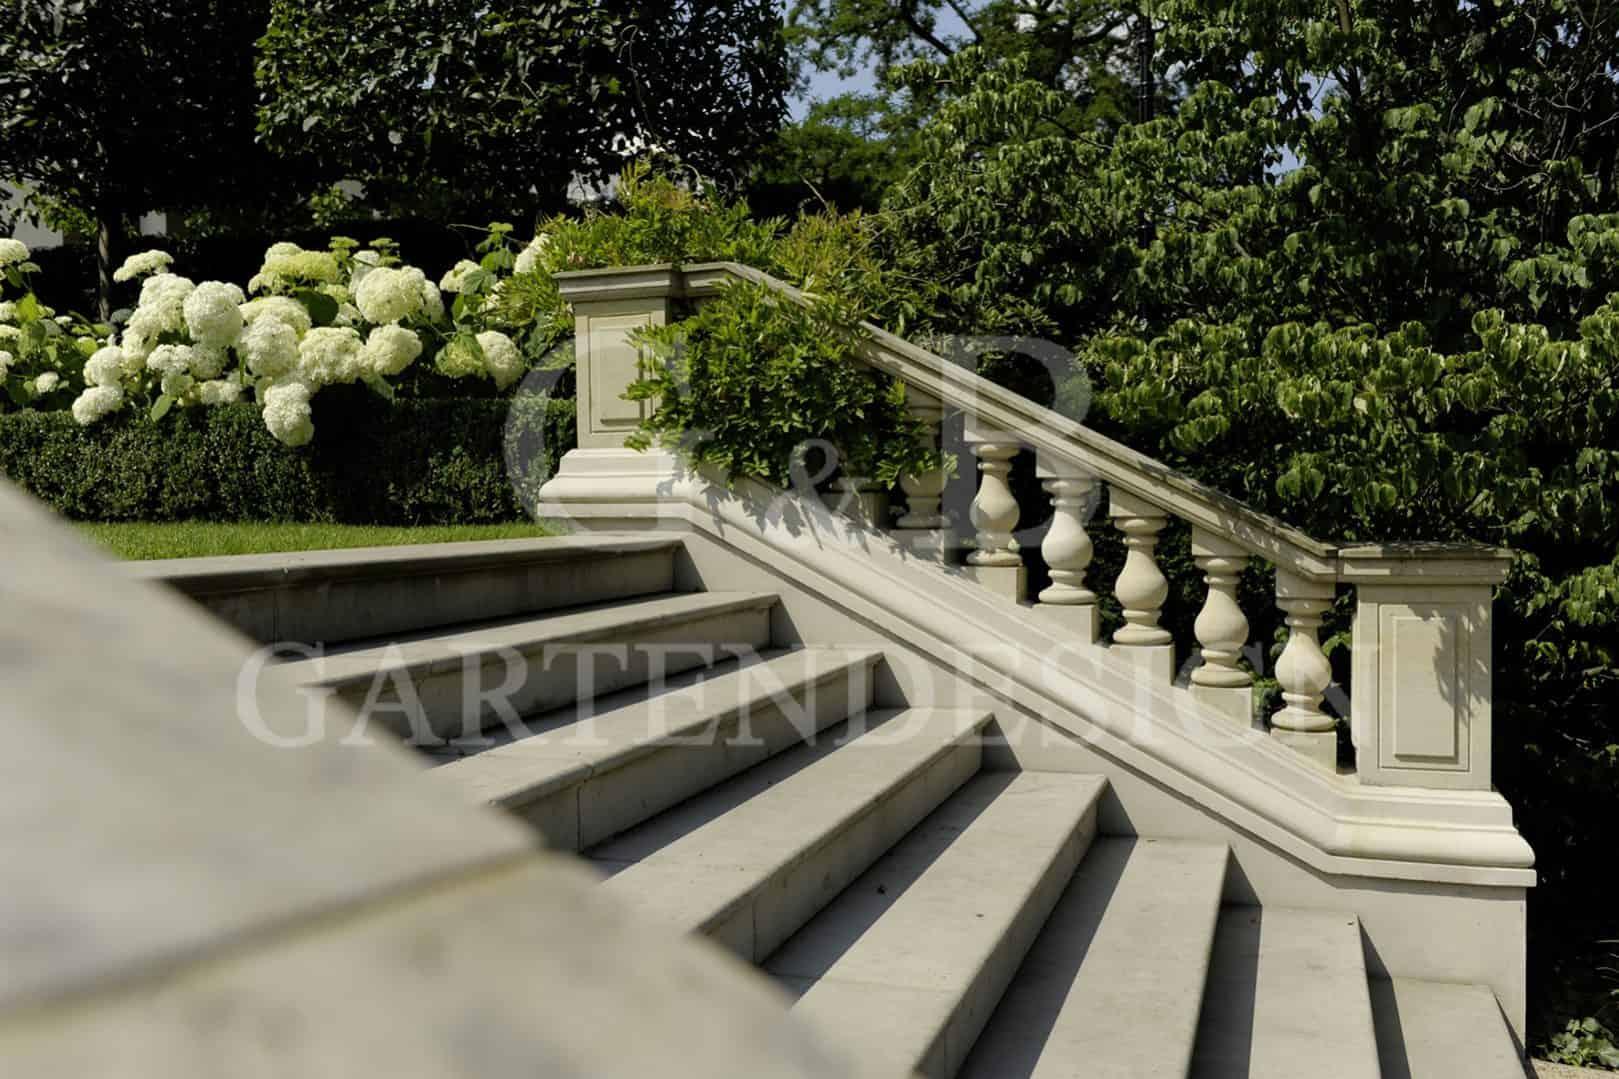 GARTENPLANUNG | GARTENARCHITEKTUR | Gempp Gartendesign